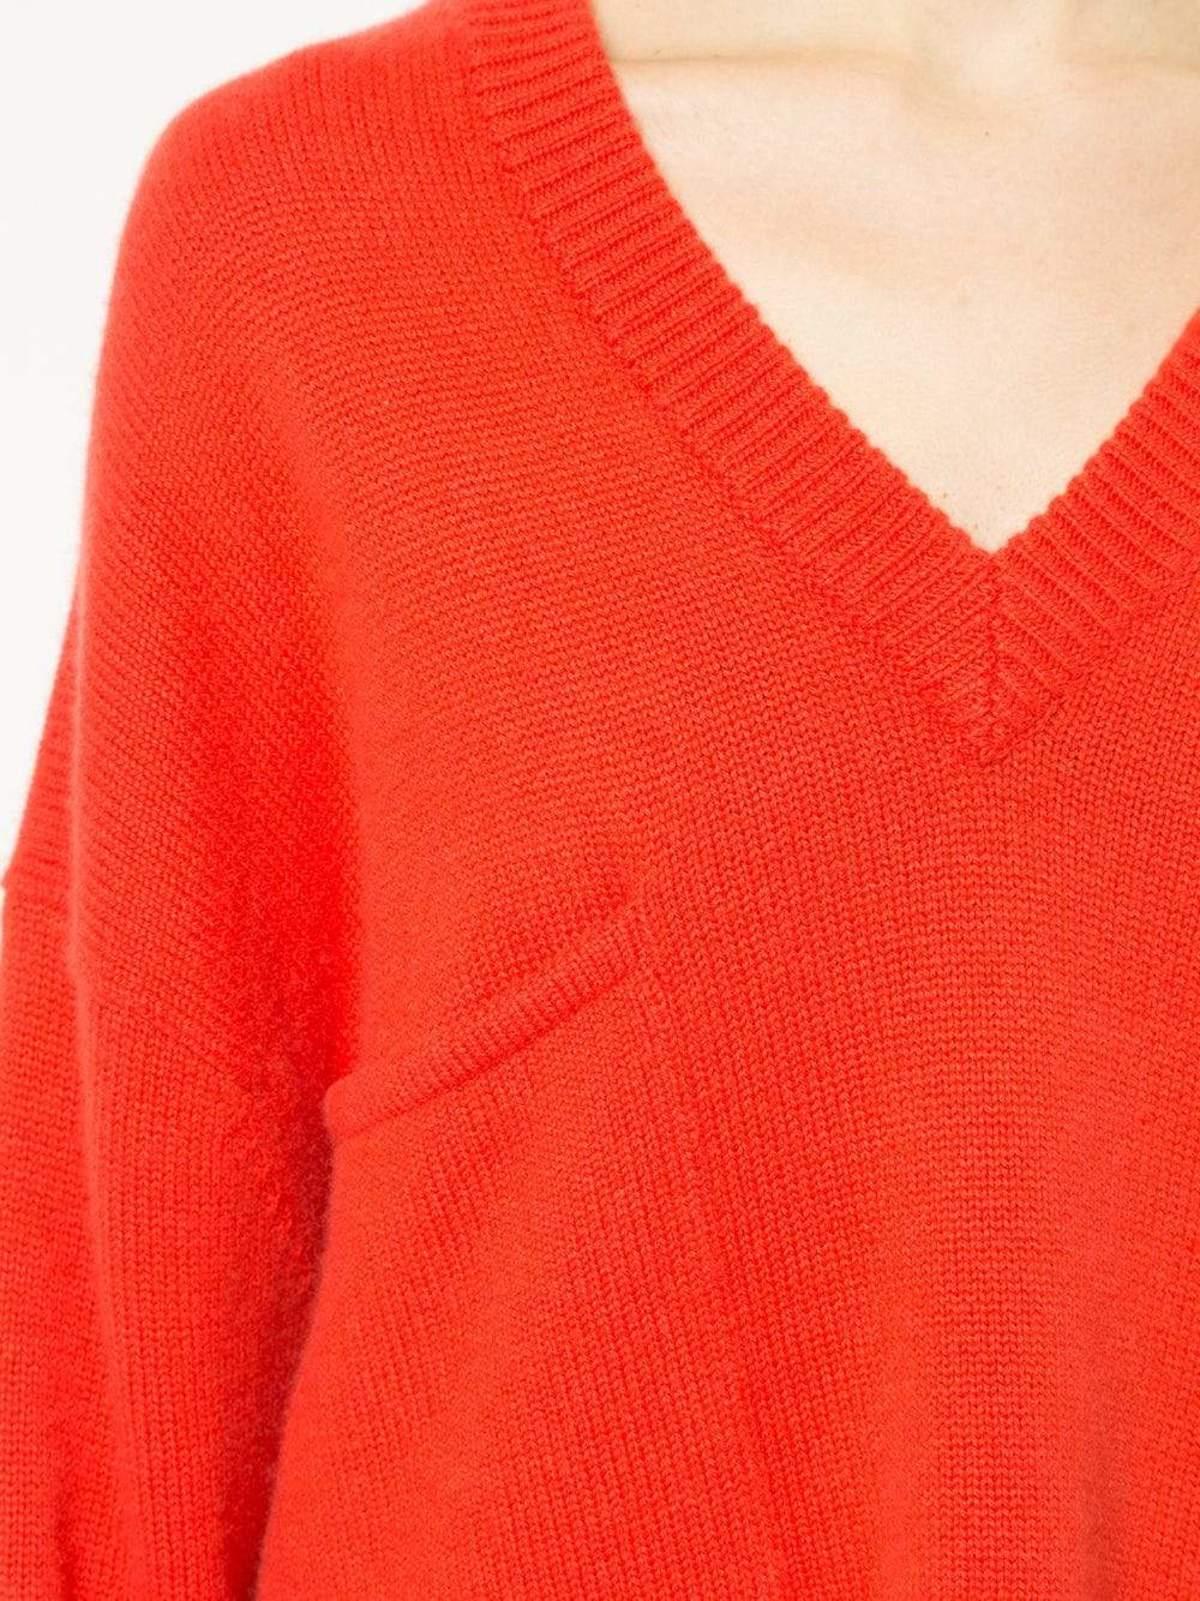 1a3e2e9af55f4a Tibi Cashmere V-Neck Oversized Pullover - Ribbon Red | Garmentory